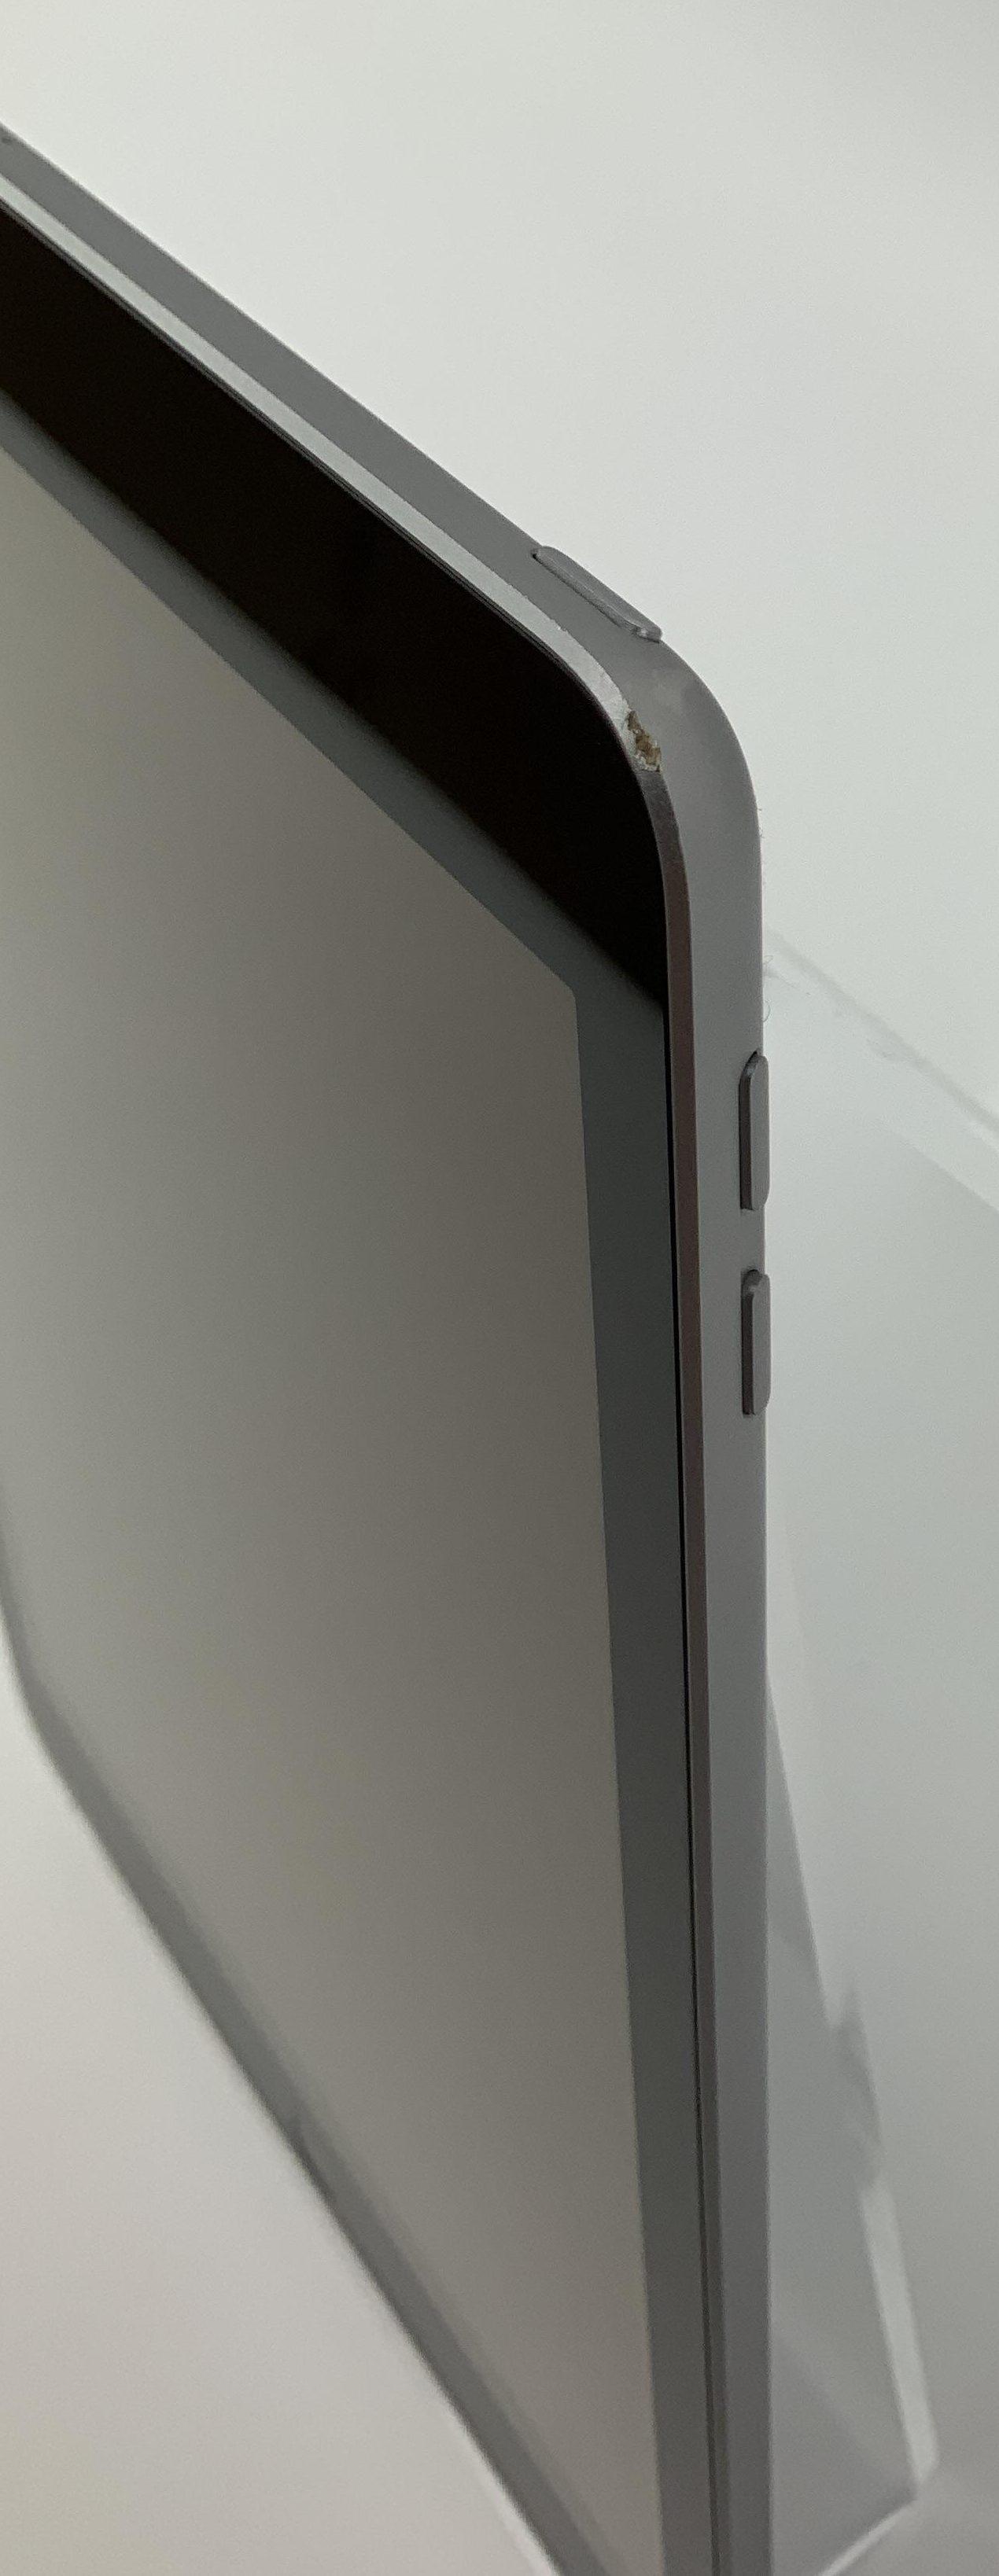 iPad 6 Wi-Fi 32GB, 32GB, Space Gray, Bild 3